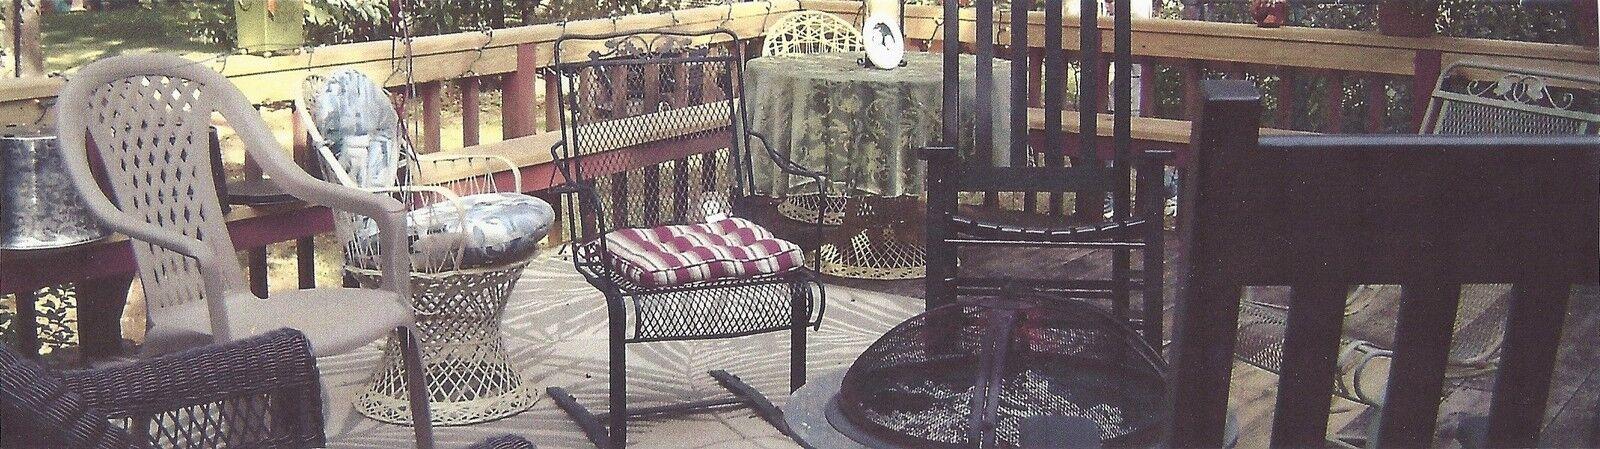 Nana's Porch